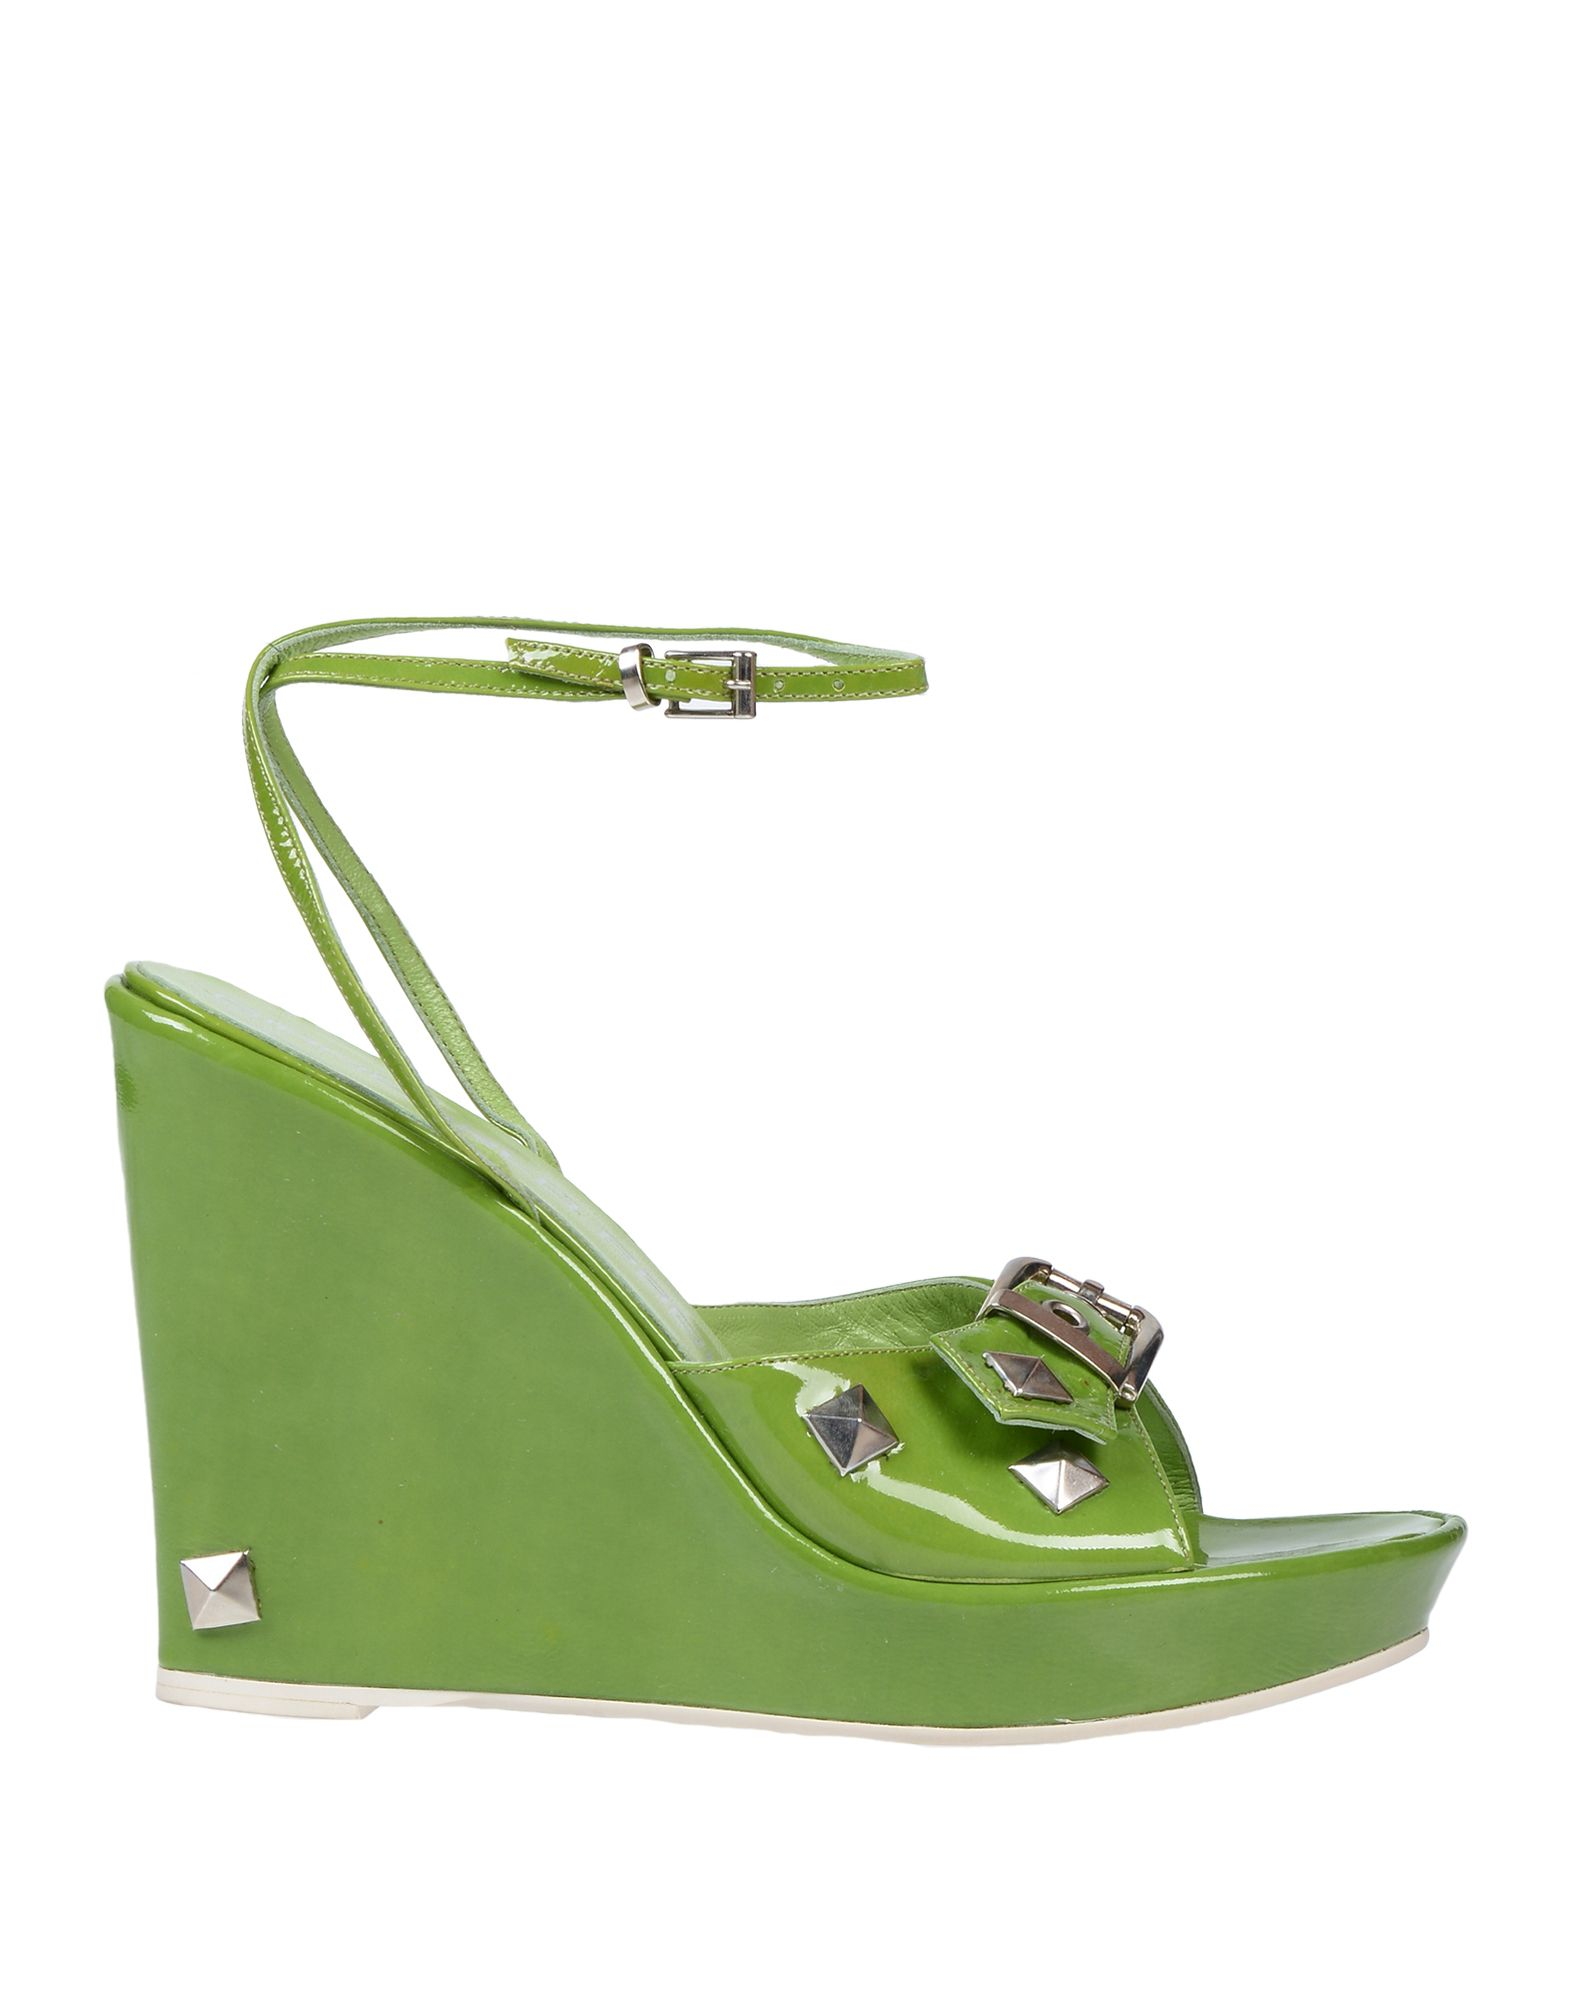 Giancarlo Paoli Sandals Sandals Sandals - Women Giancarlo Paoli Sandals online on  United Kingdom - 11509366FT 4043db